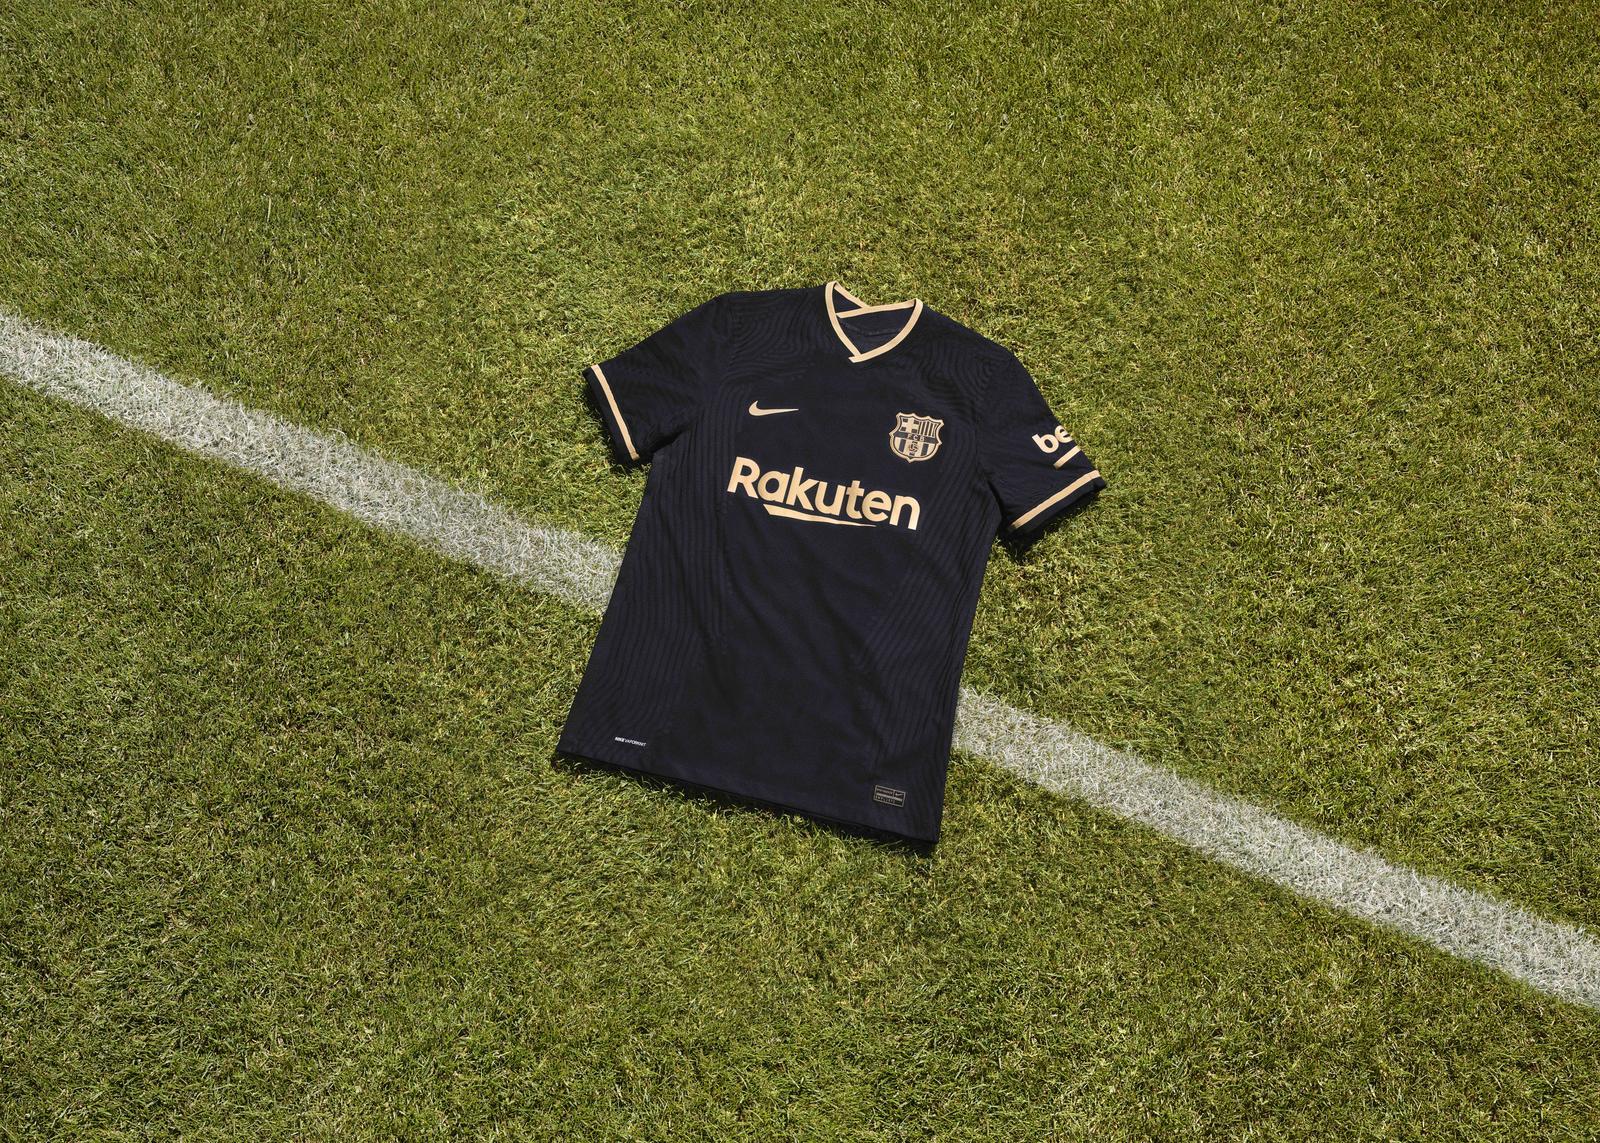 fc-barcelona-2020-21-away-kit